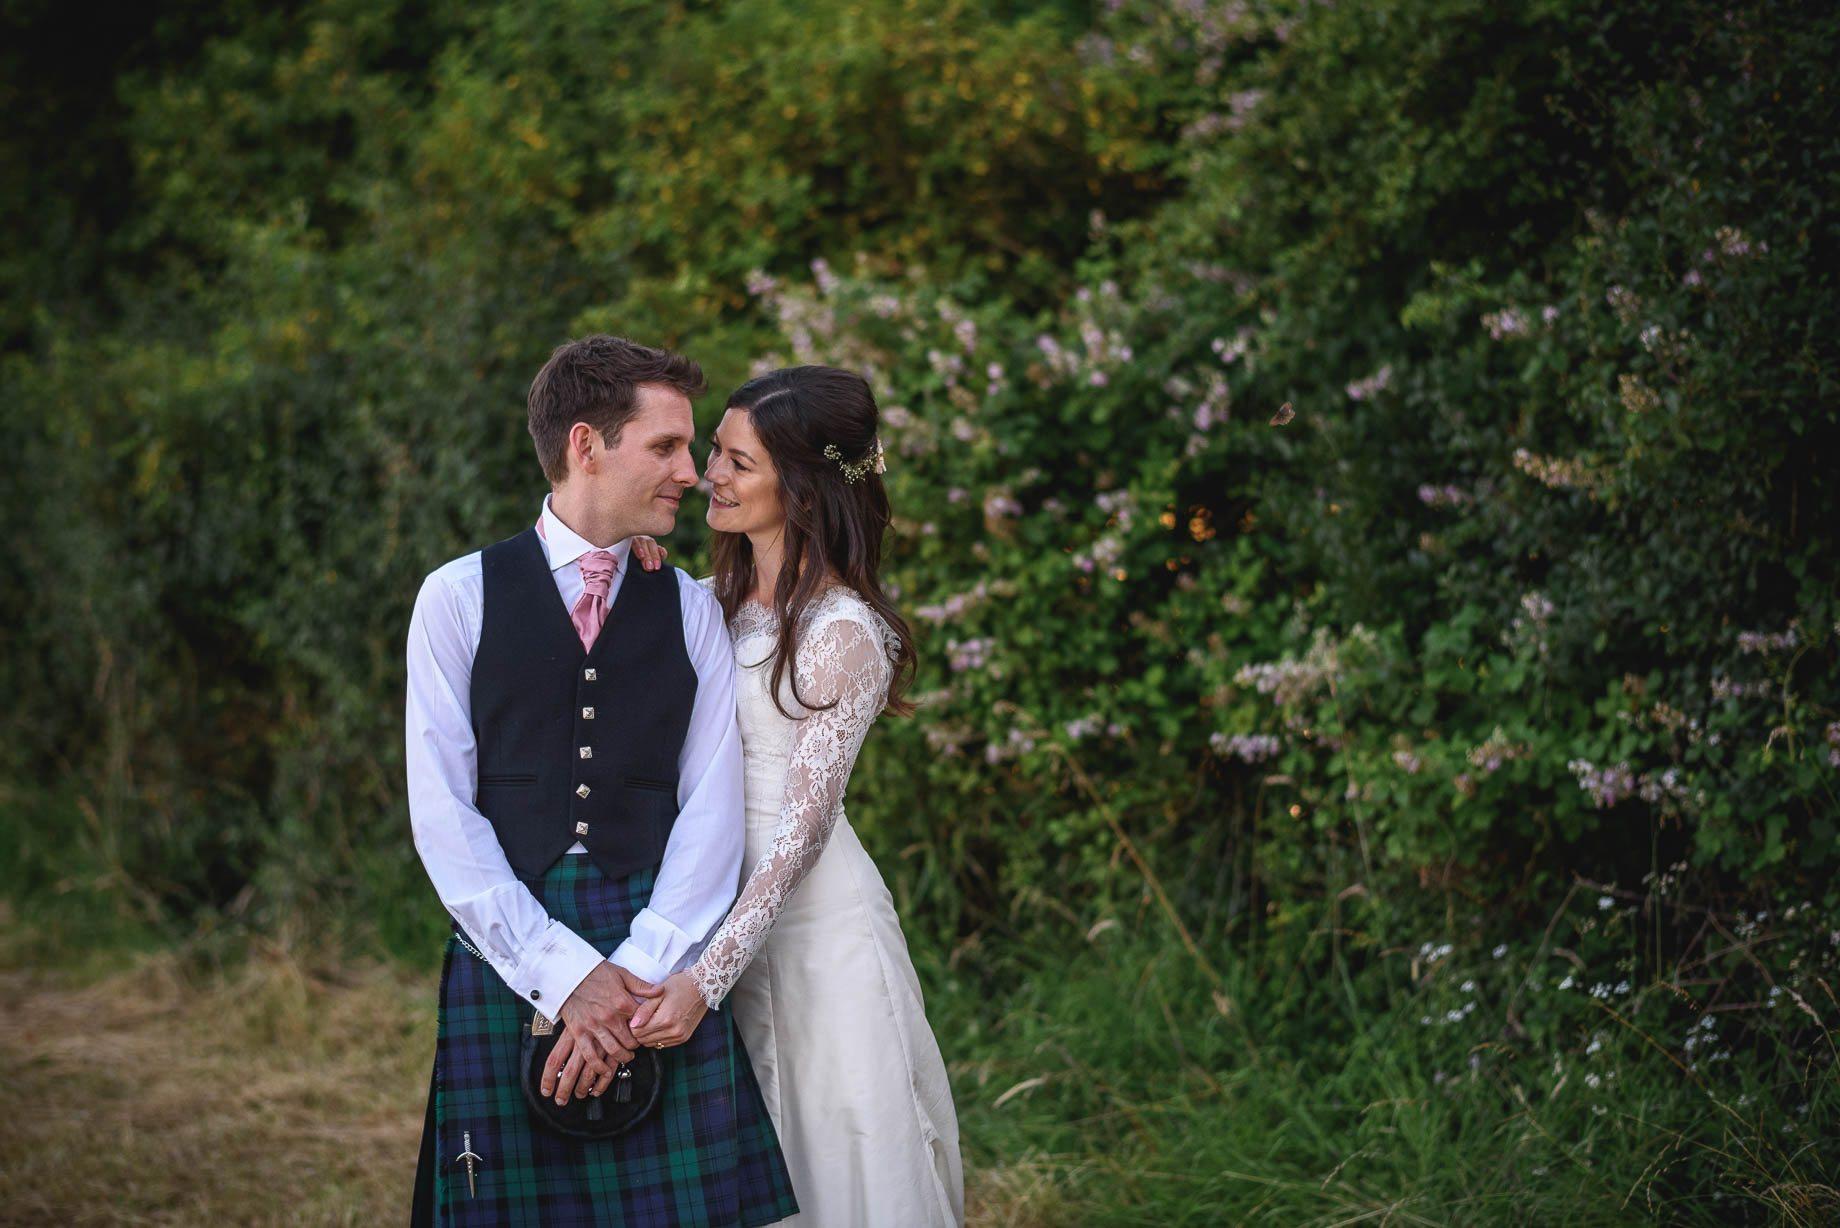 Gildings Barn wedding photography - Sarah and Steve (165 of 190)